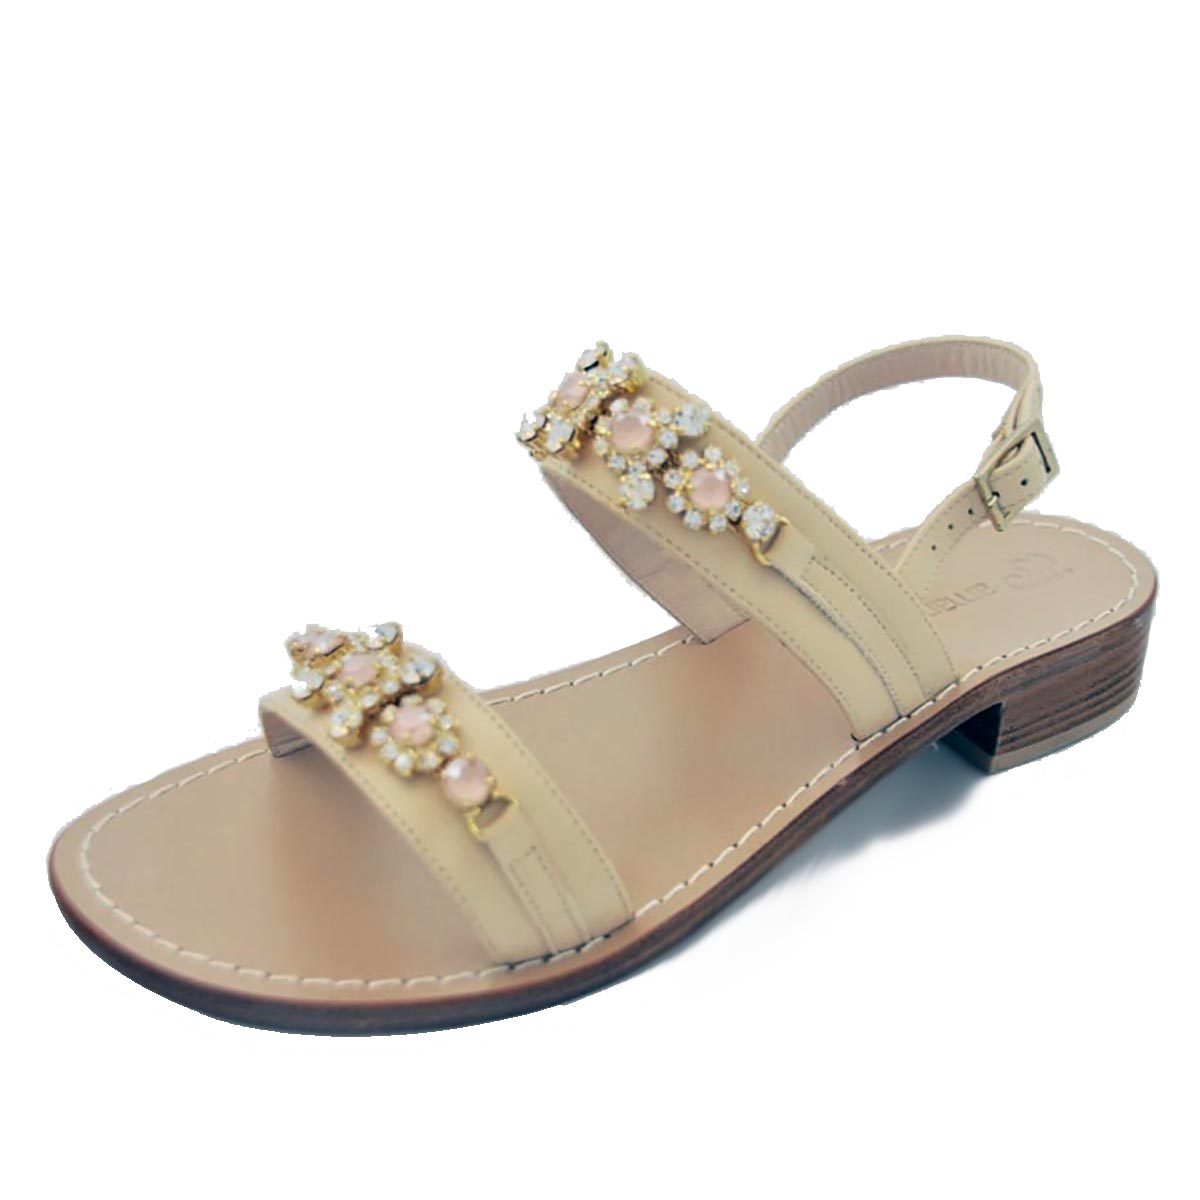 Amanda Jayne - Roxy Summer Sandal